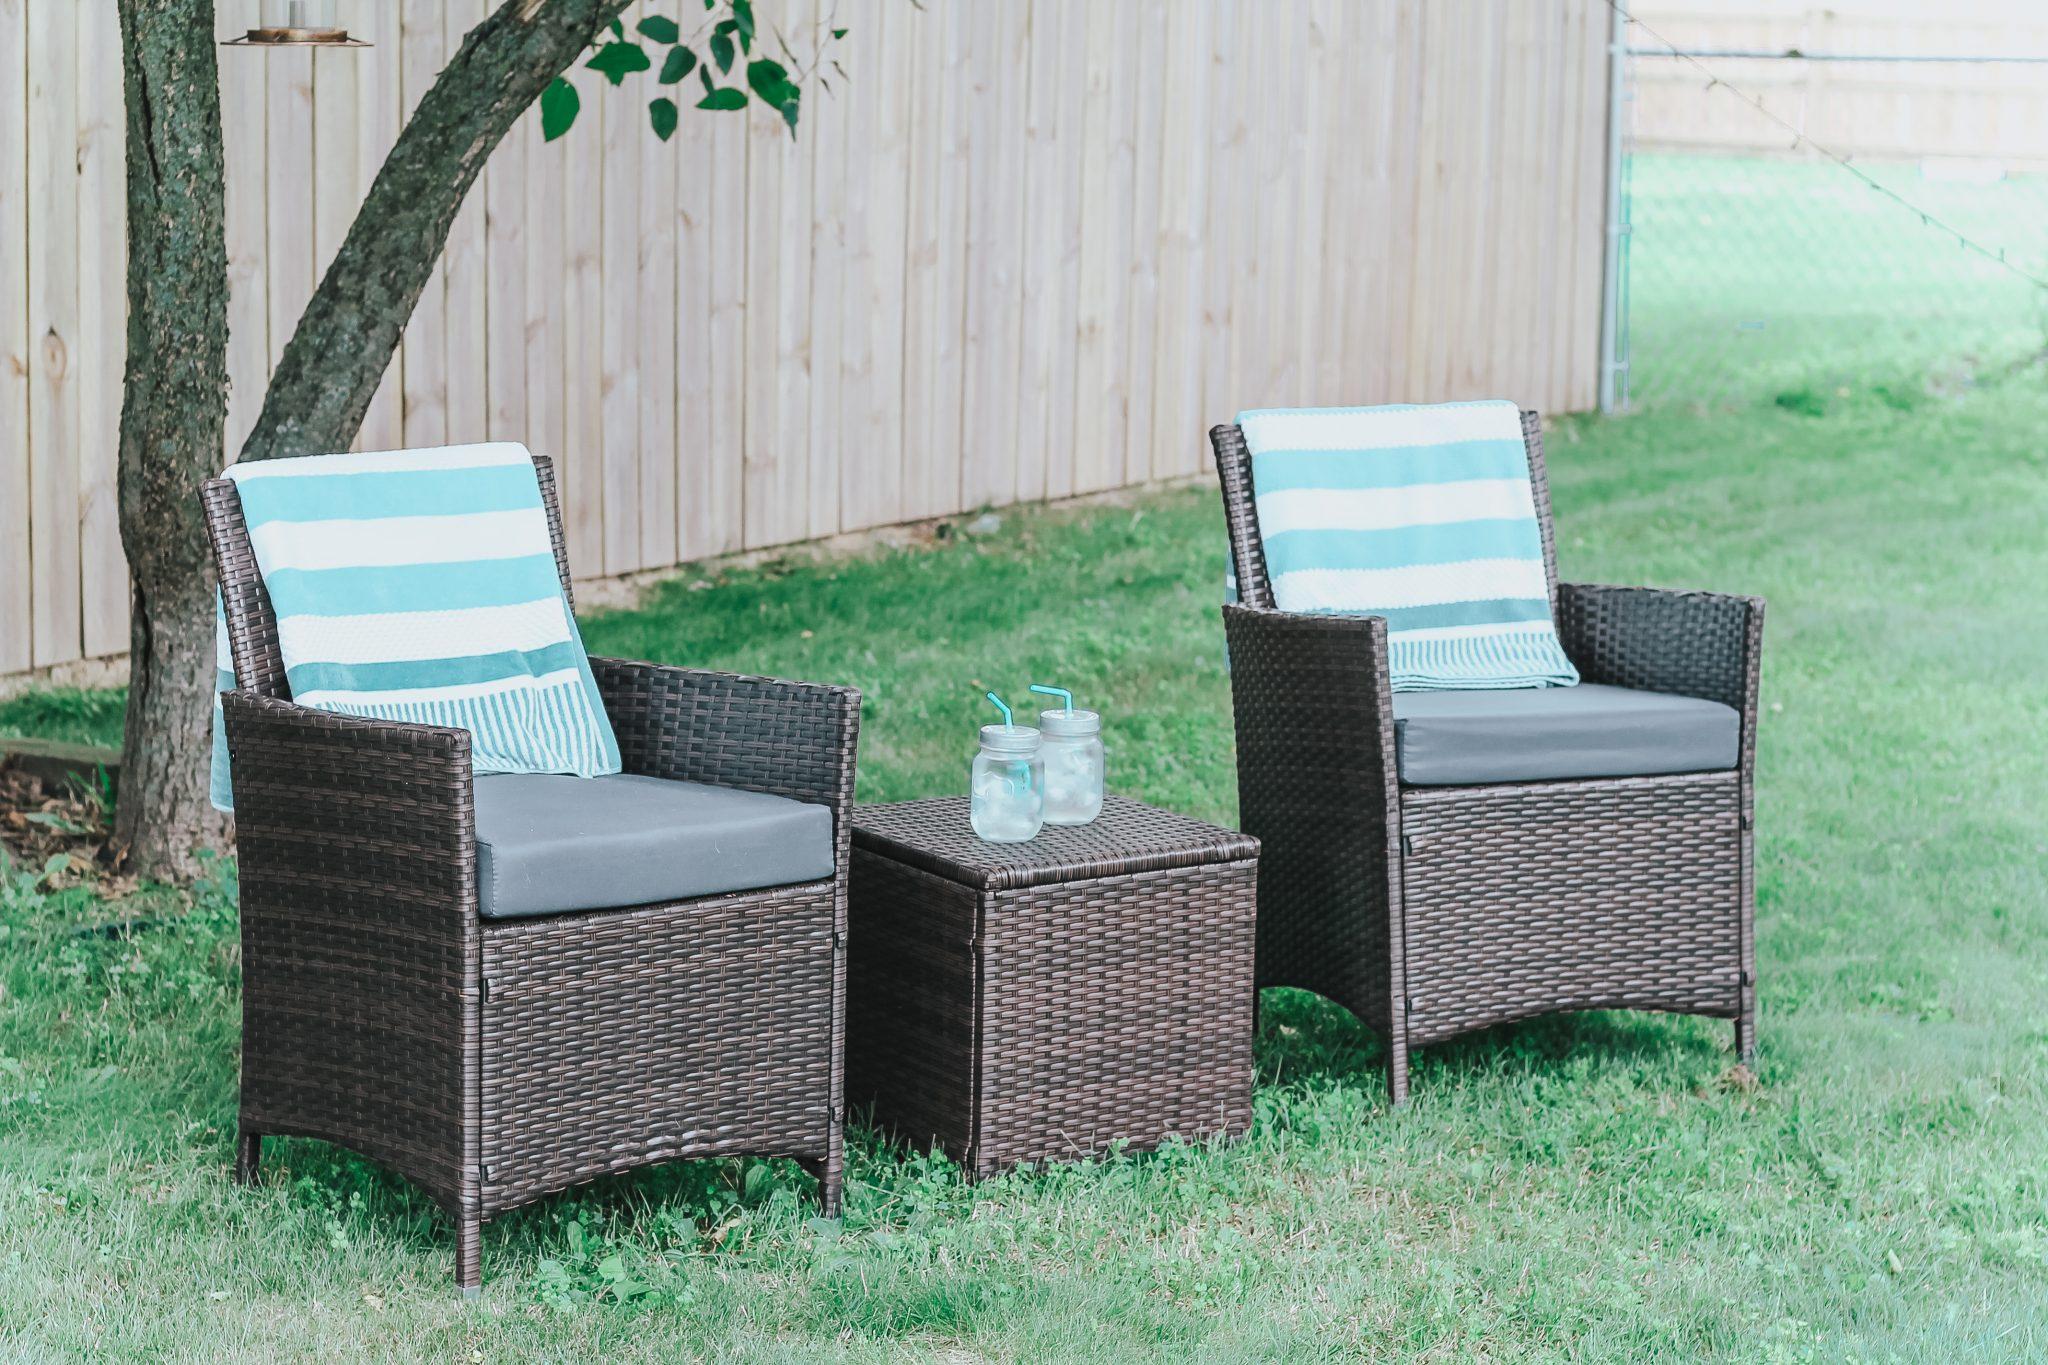 Creating a Backyard Family Oasis